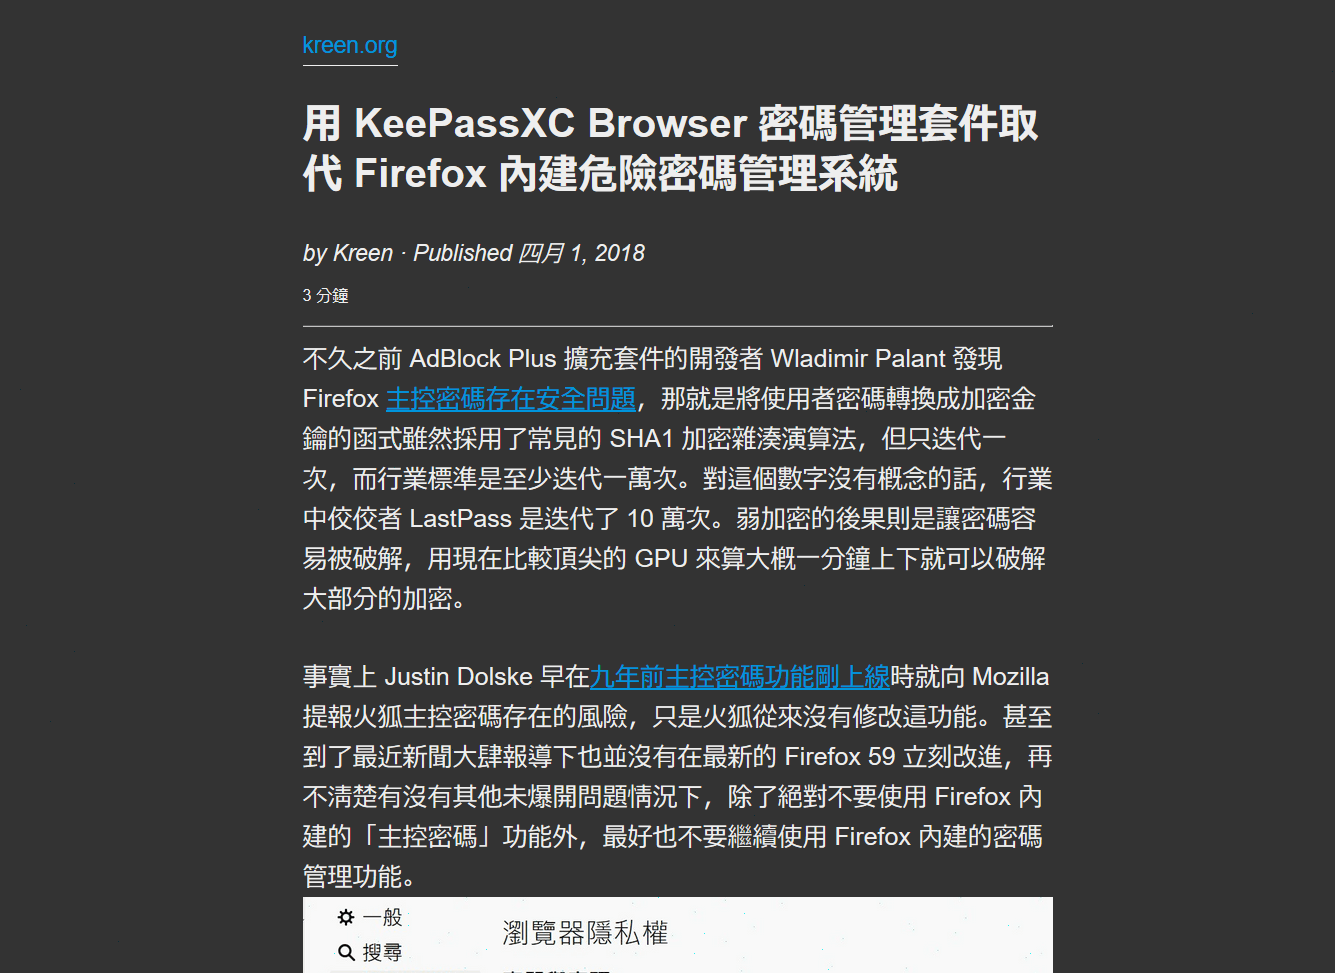 Firefox 60 閱讀模式